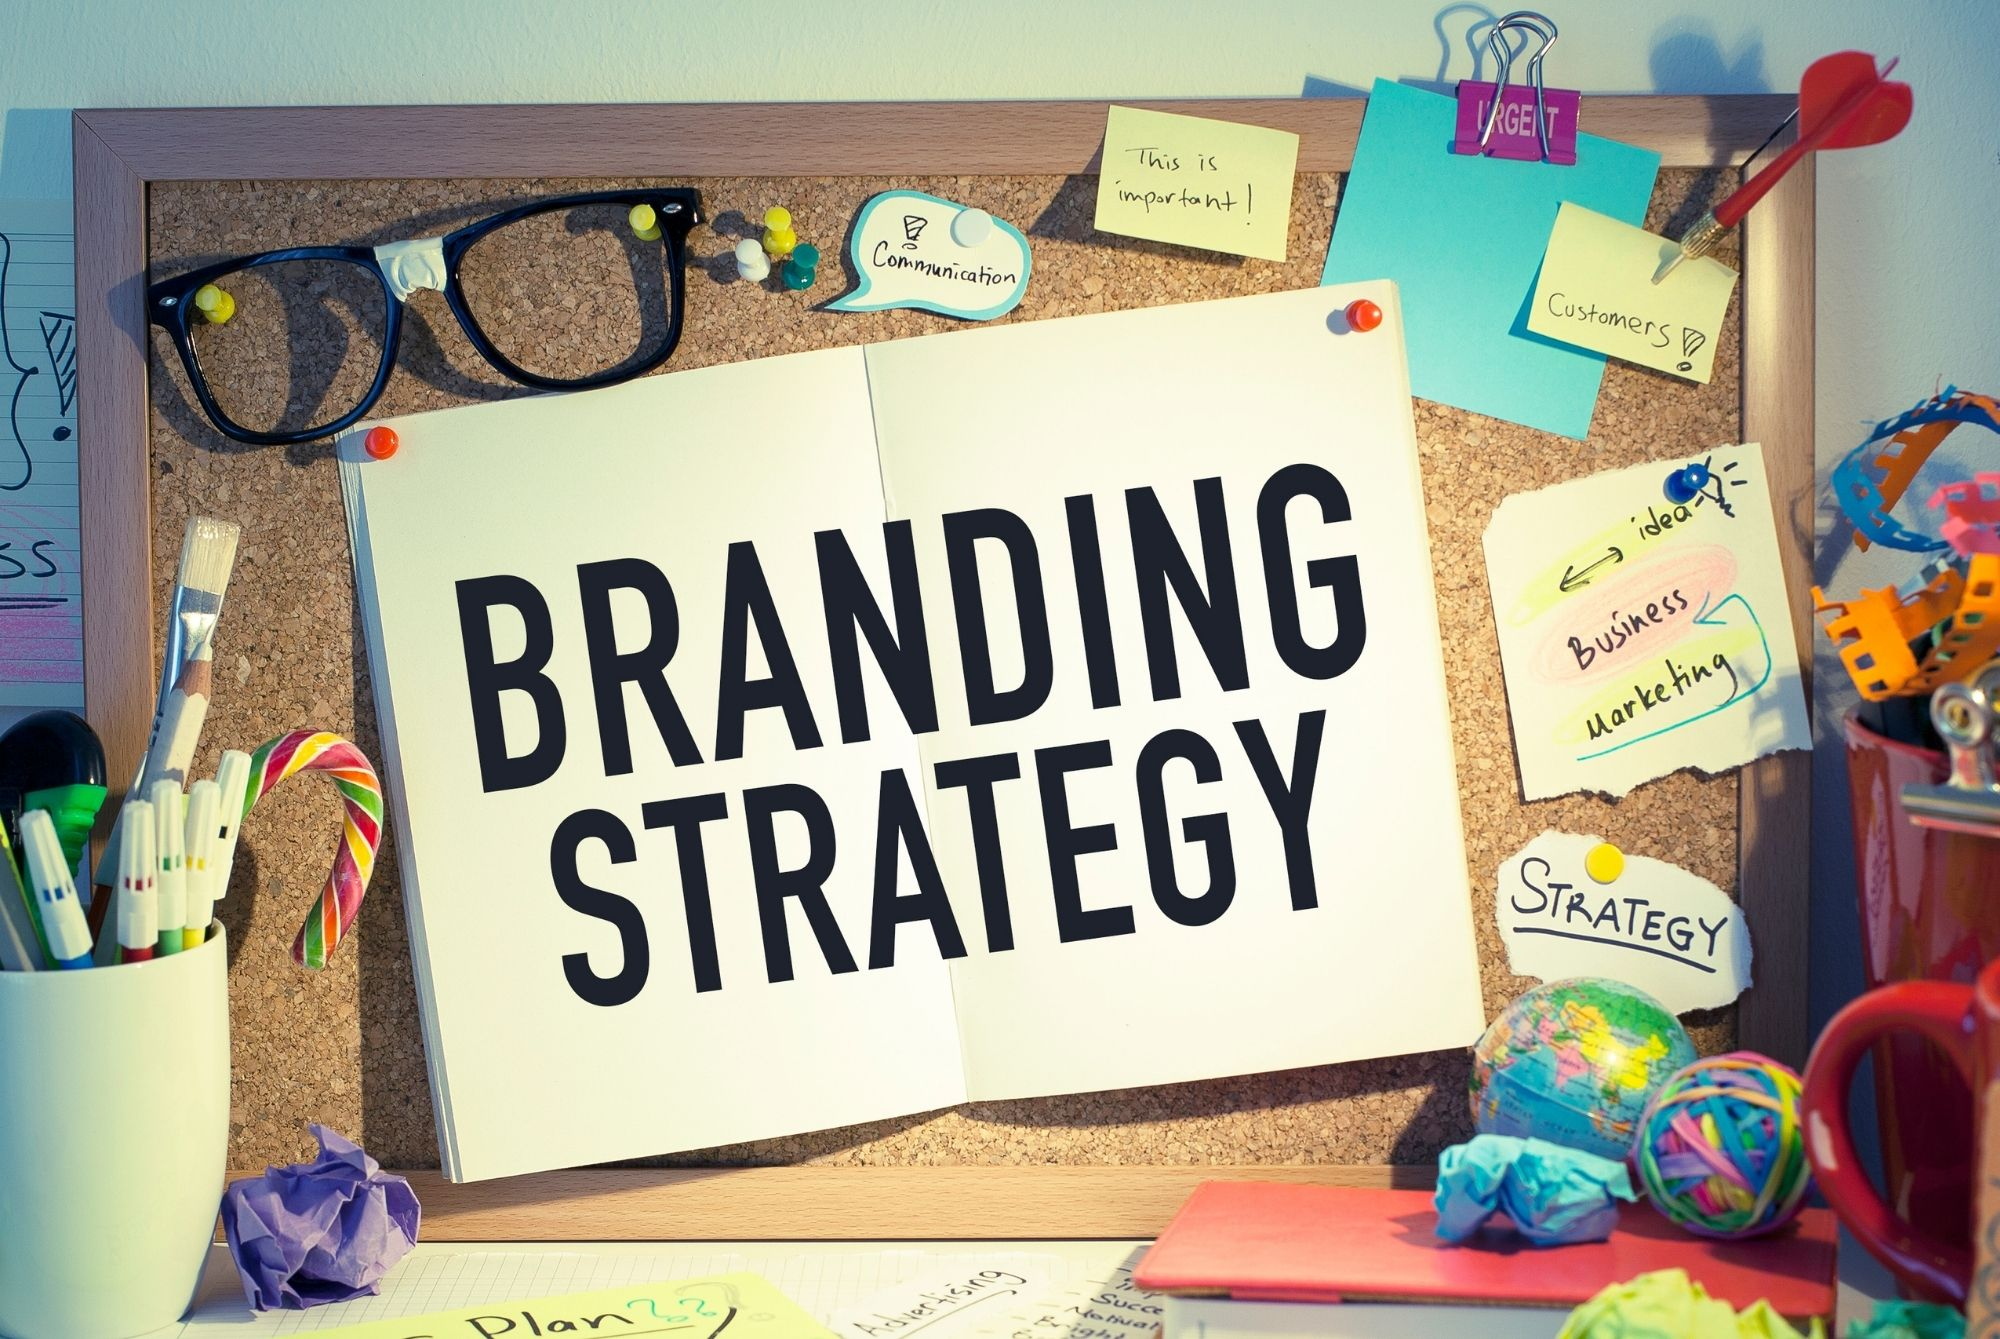 Branding & Strategy Design Services